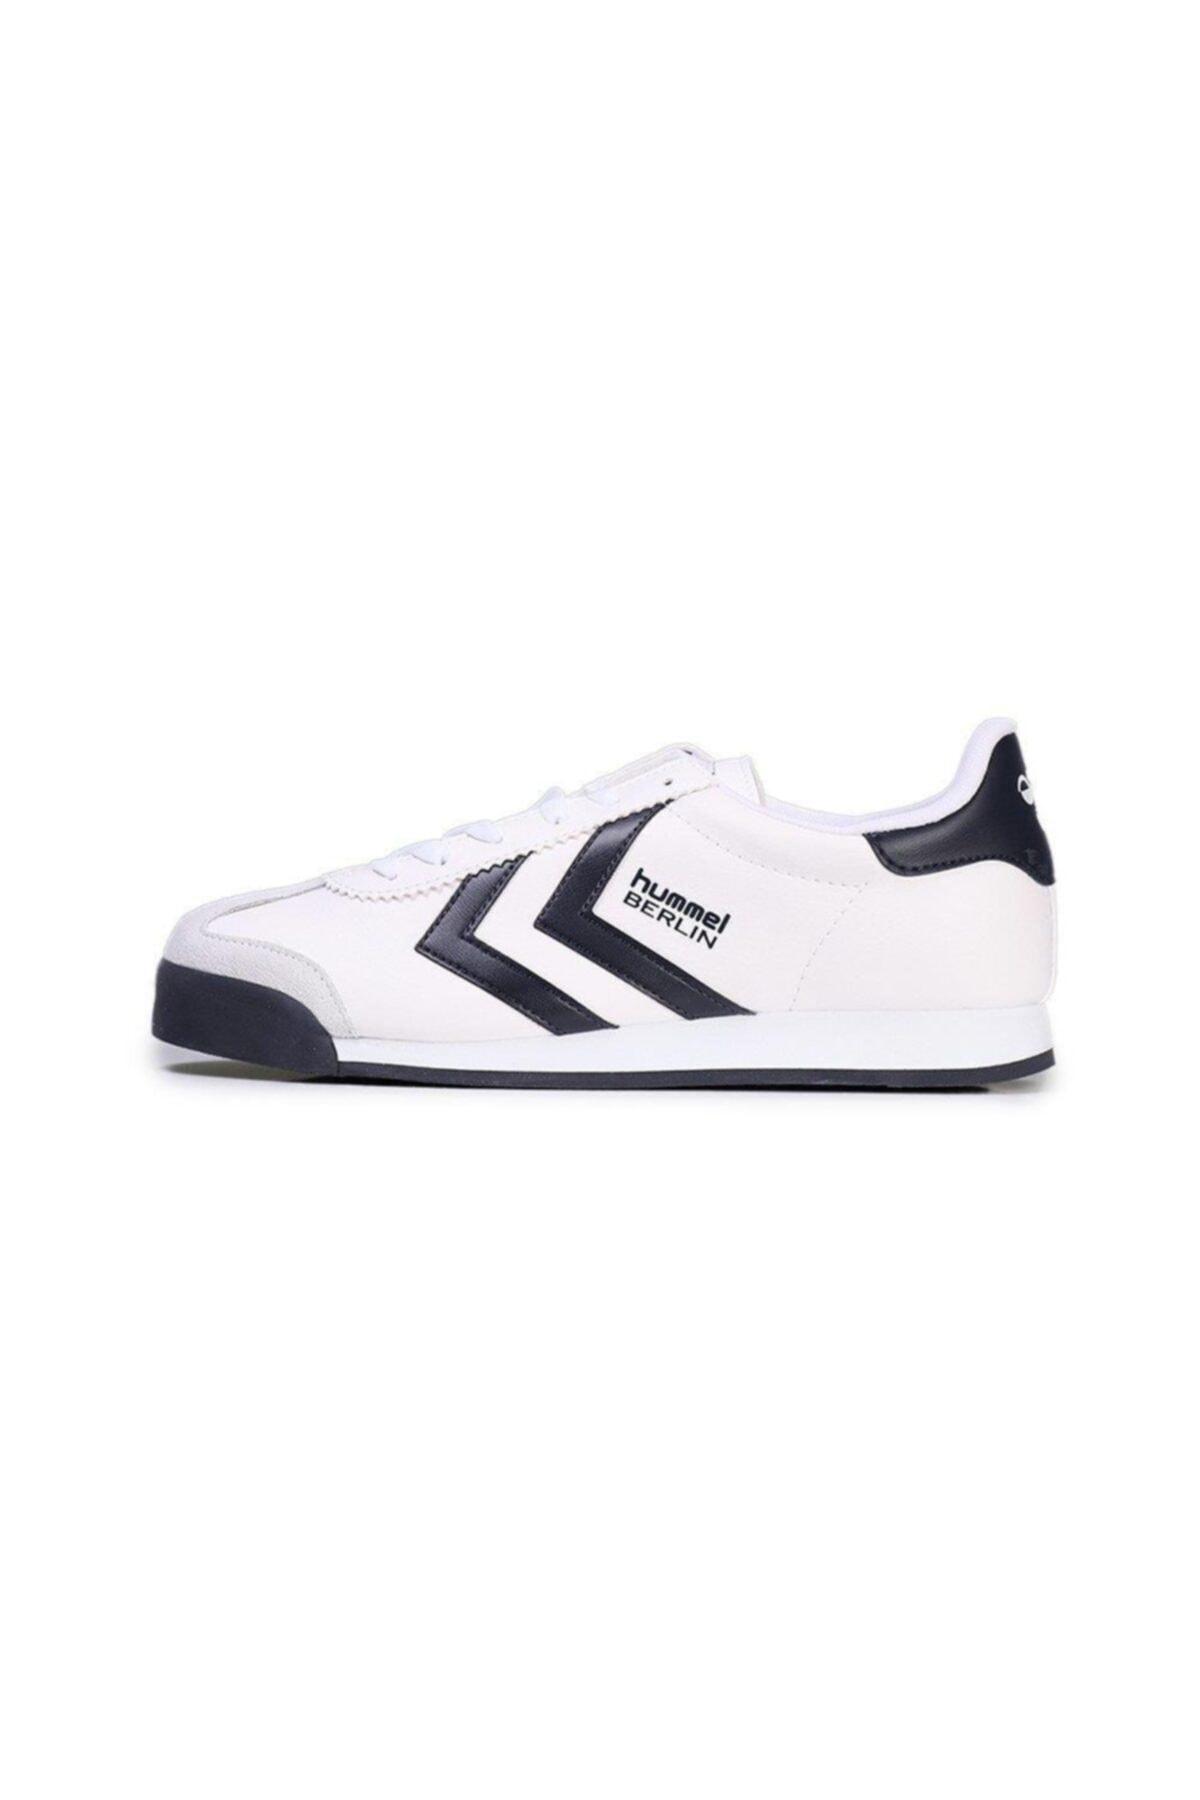 HUMMEL BERLIN SNEAKER Beyaz Erkek Sneaker Ayakkabı 100490259 2